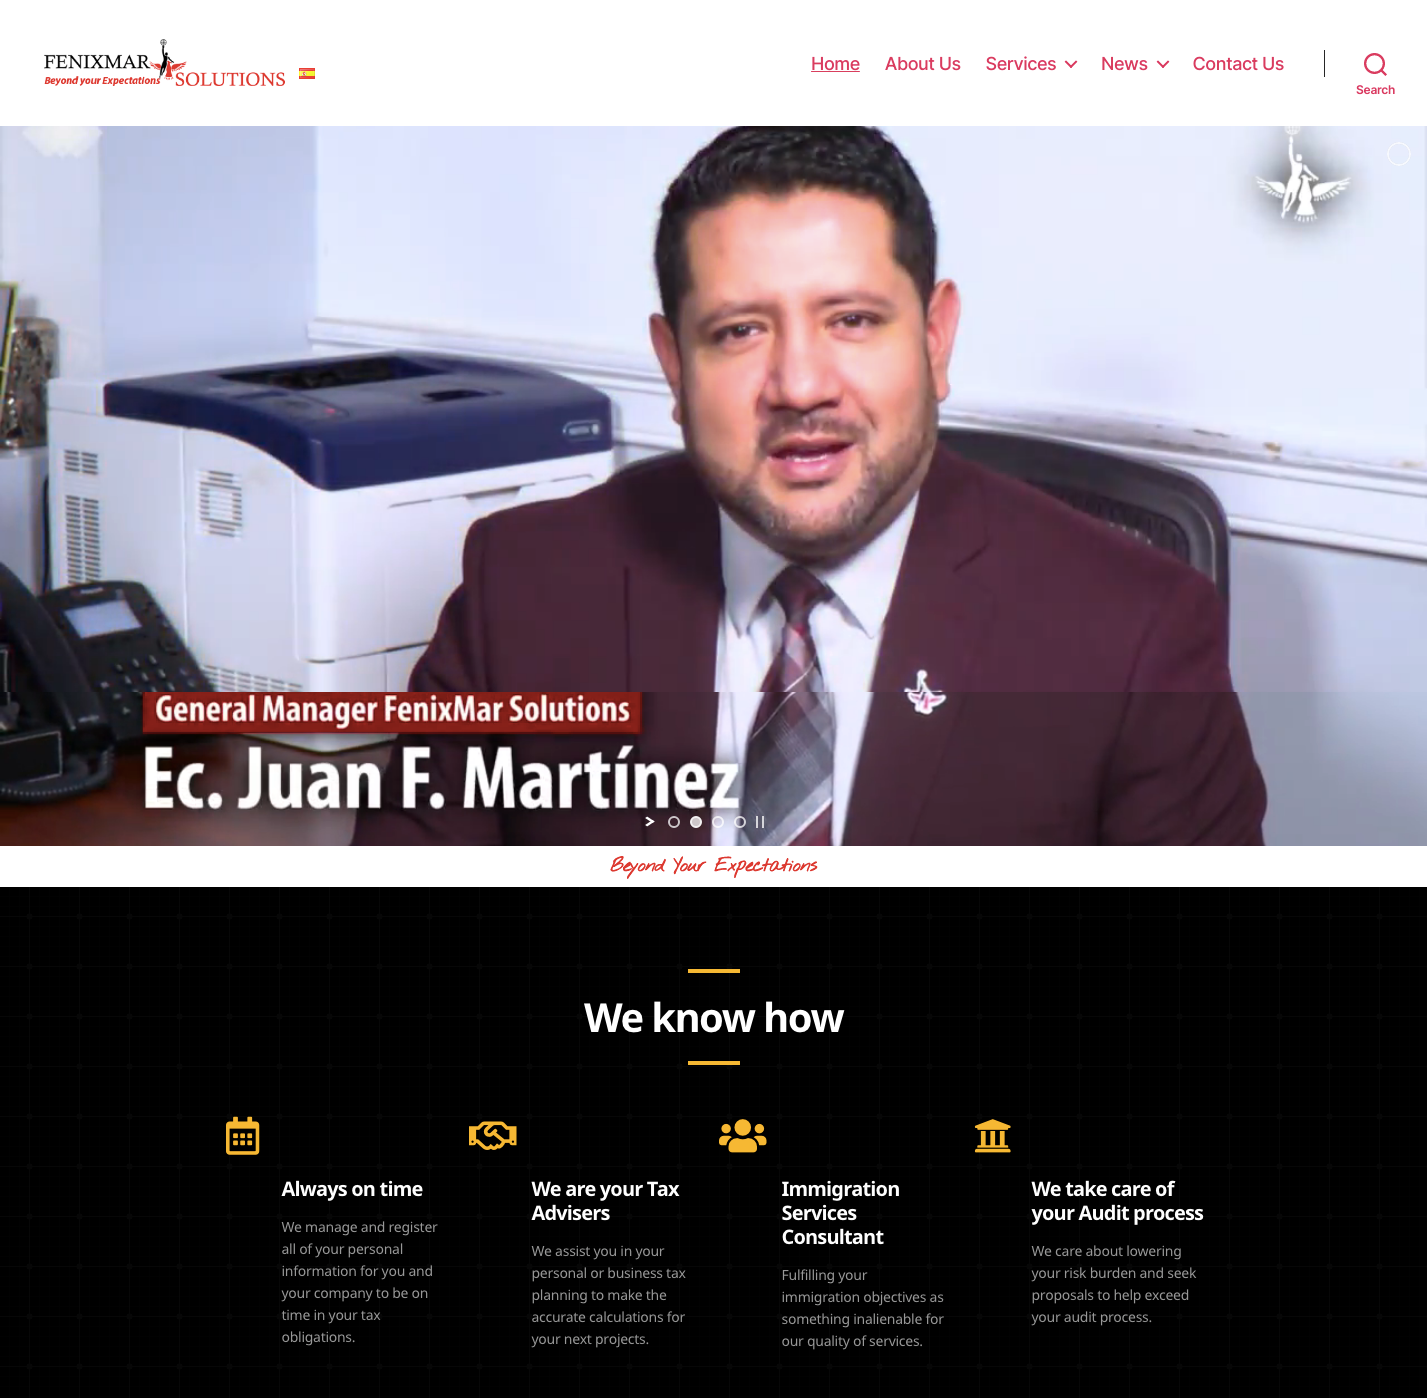 fenixmarsolutions.com